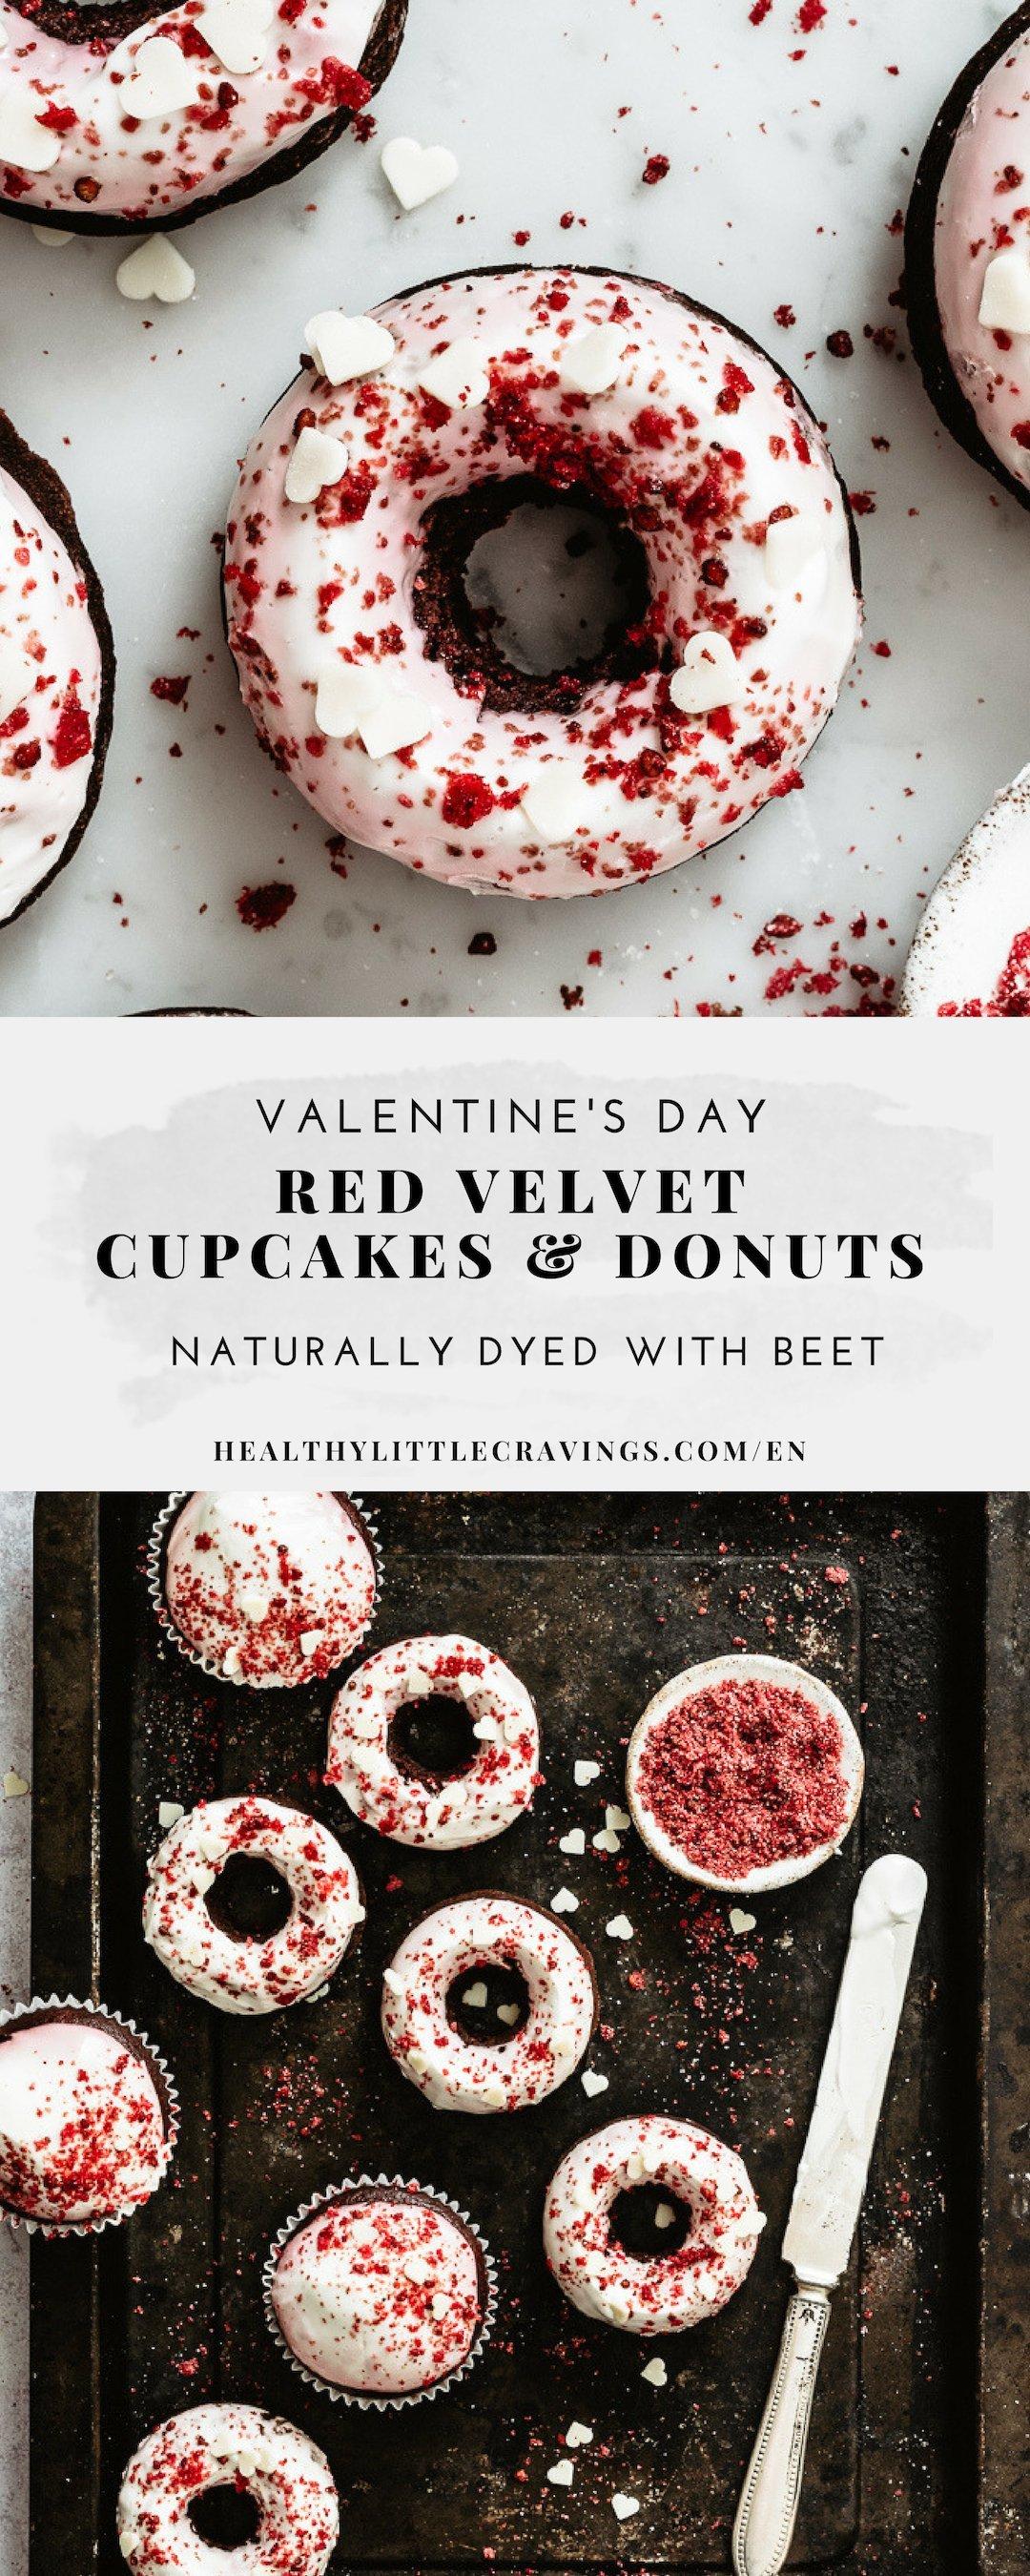 Easy red velvet cupcake recipe + donuts to pin on Pinterest